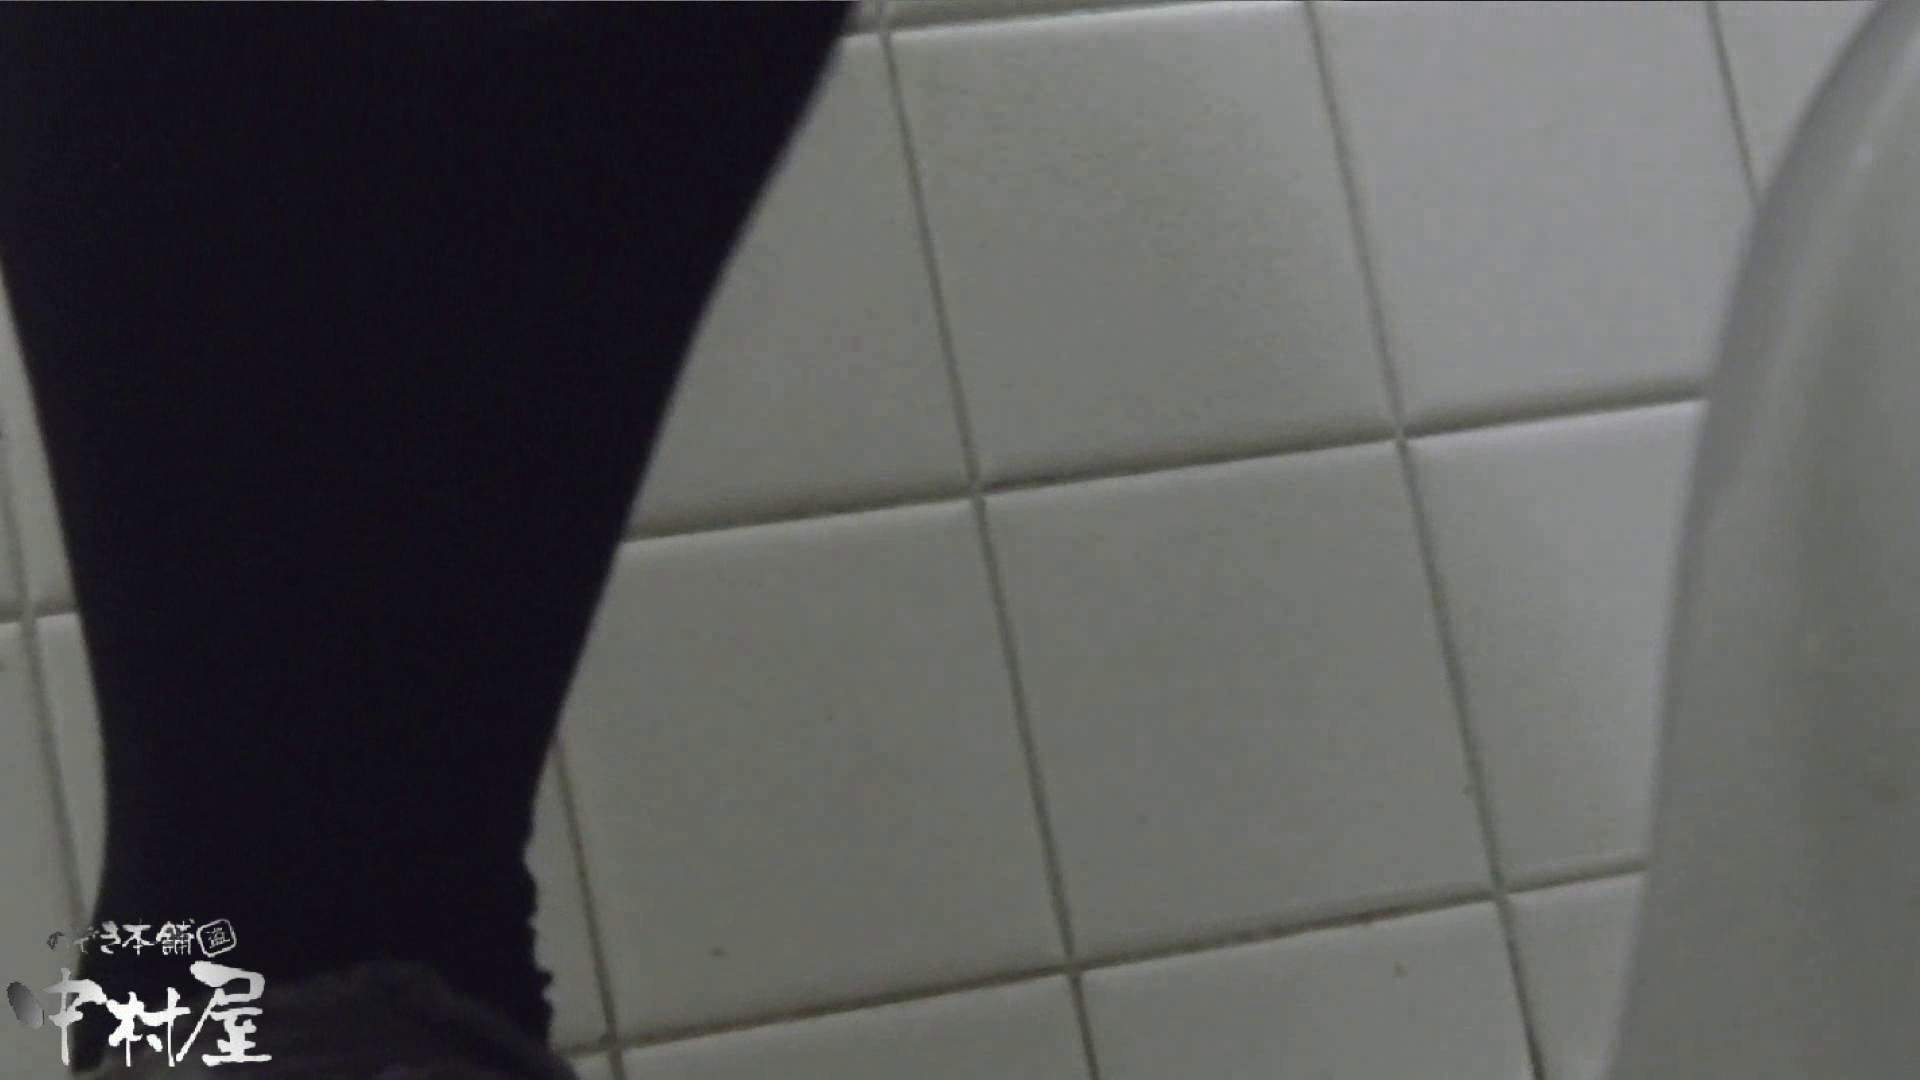 vol.18 命がけ潜伏洗面所! タッタタラリラ~♪ プライベート  95PIX 30